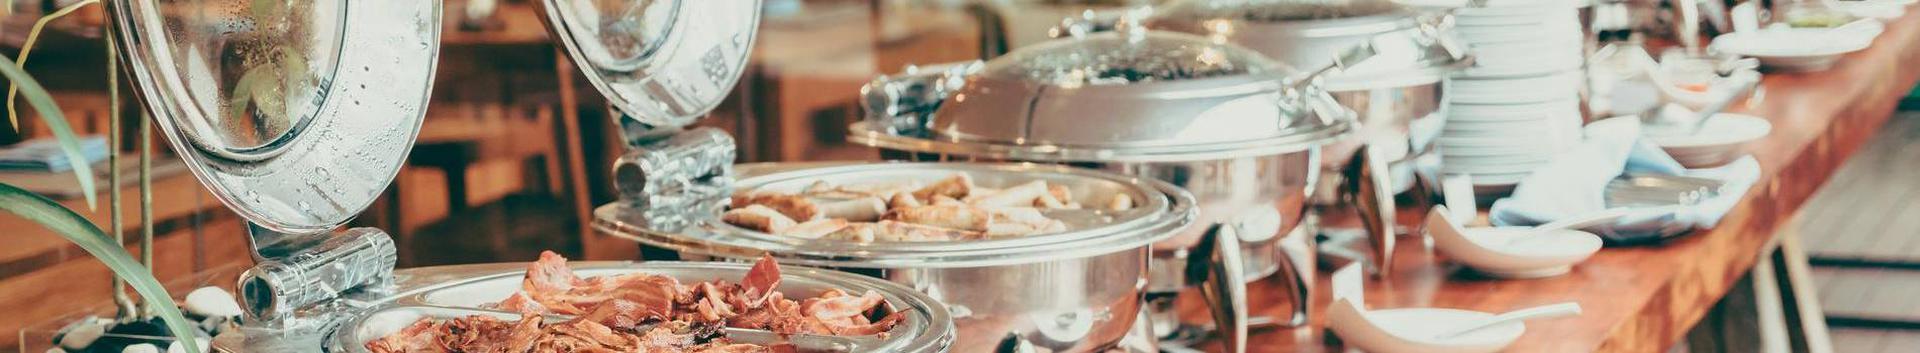 56101_toitlustus-restoran-jm-_65939512_xl.jpg